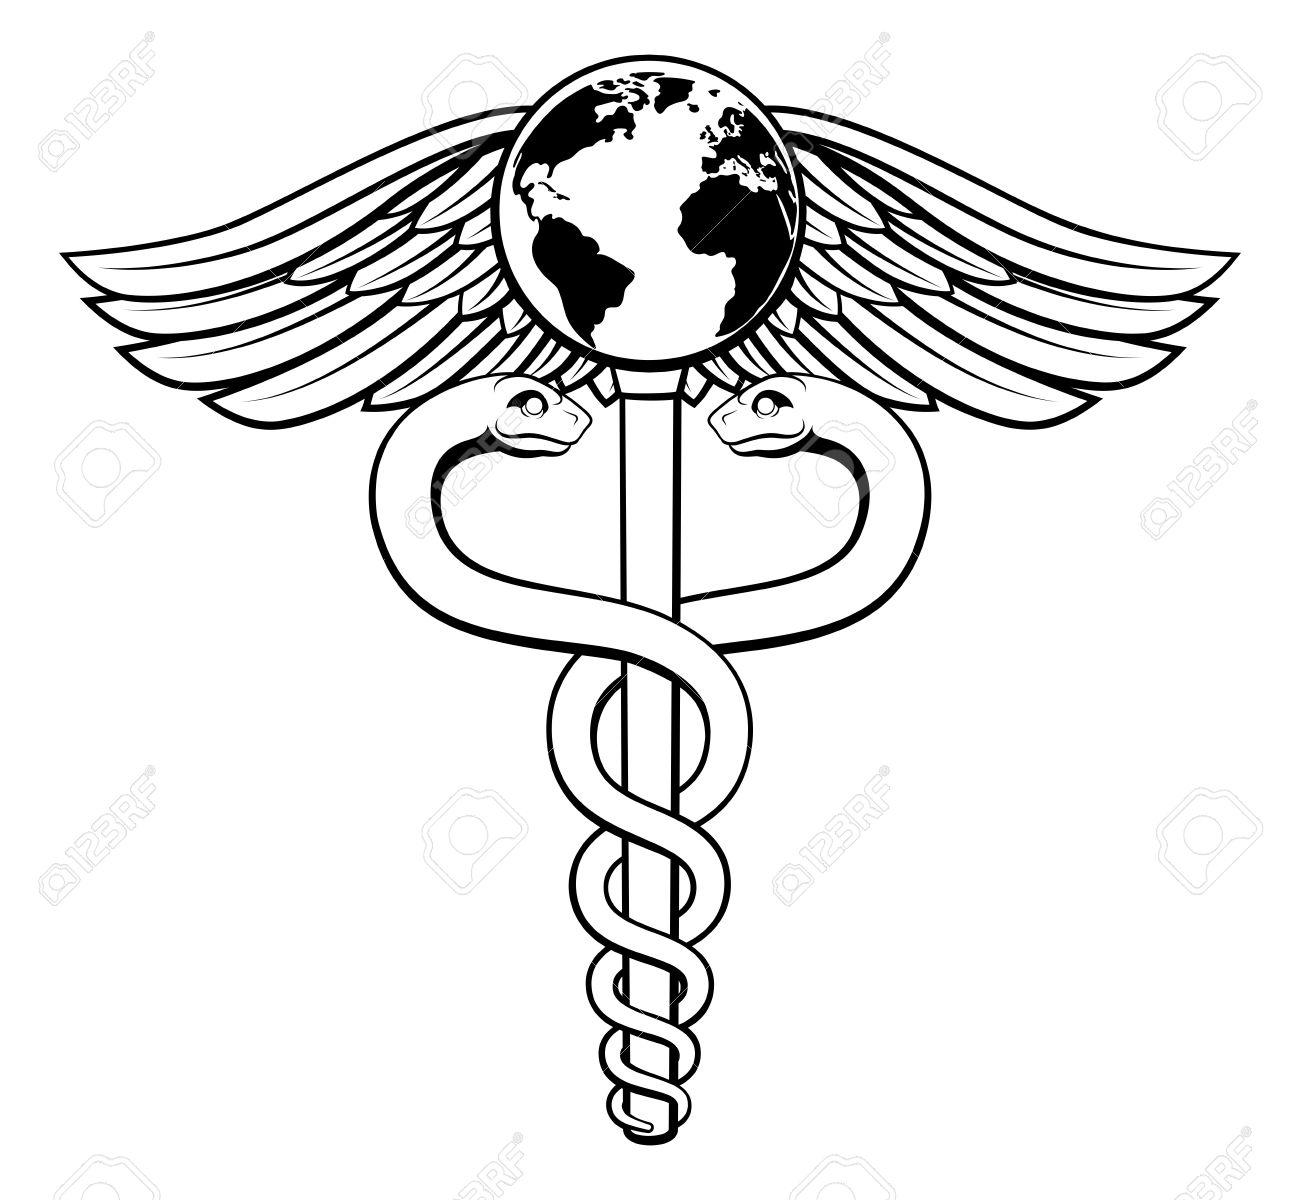 1300x1200 A Caduceus Medical Symbol Concept Of A Medical Or Hearth Care